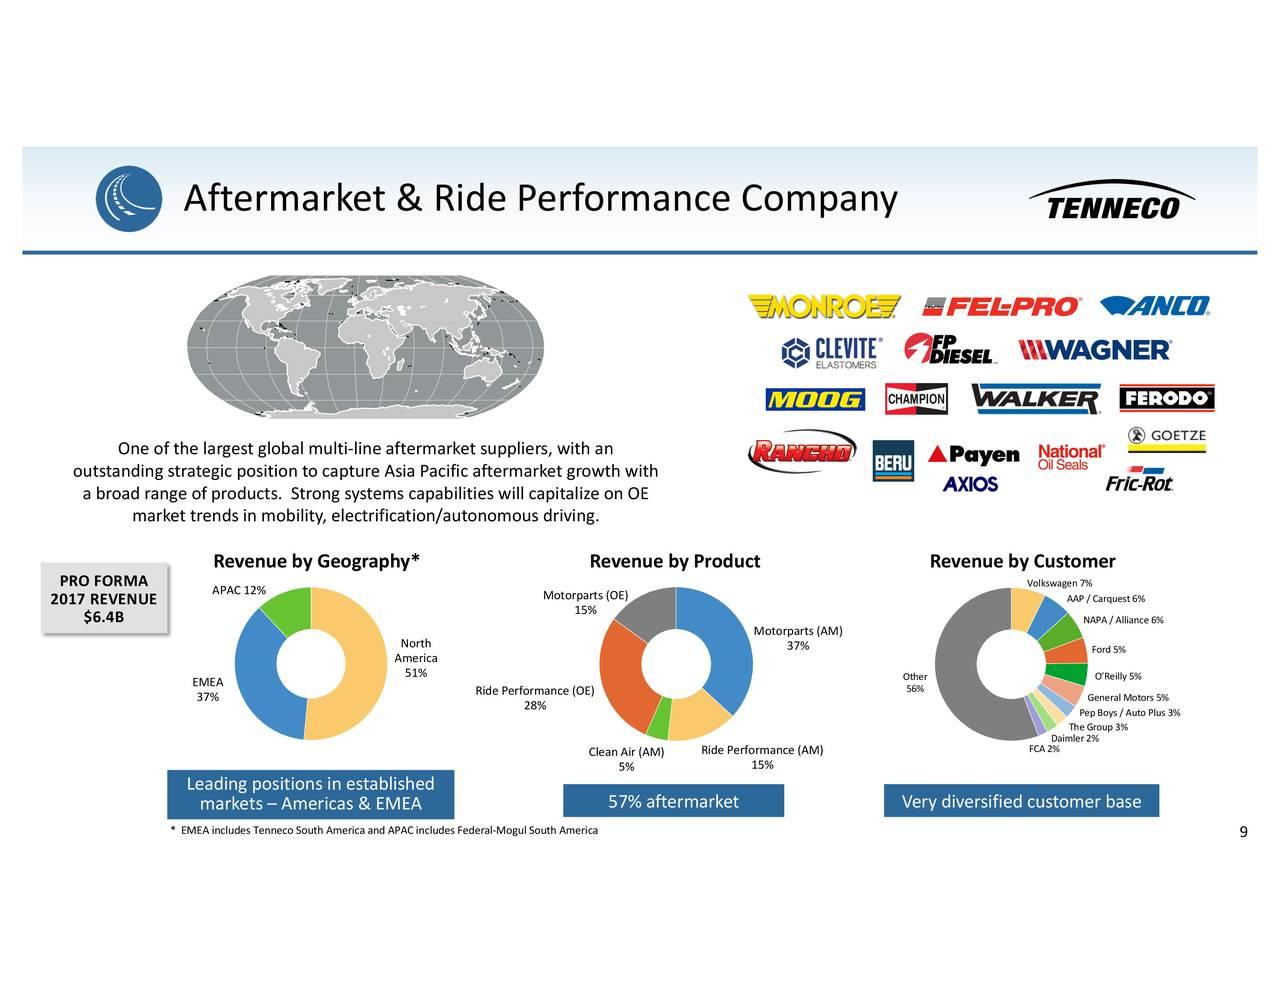 Tenneco (TEN) acquires Federal-Mogul - Slideshow - Tenneco Inc. (NYSE:TEN)   Seeking Alpha